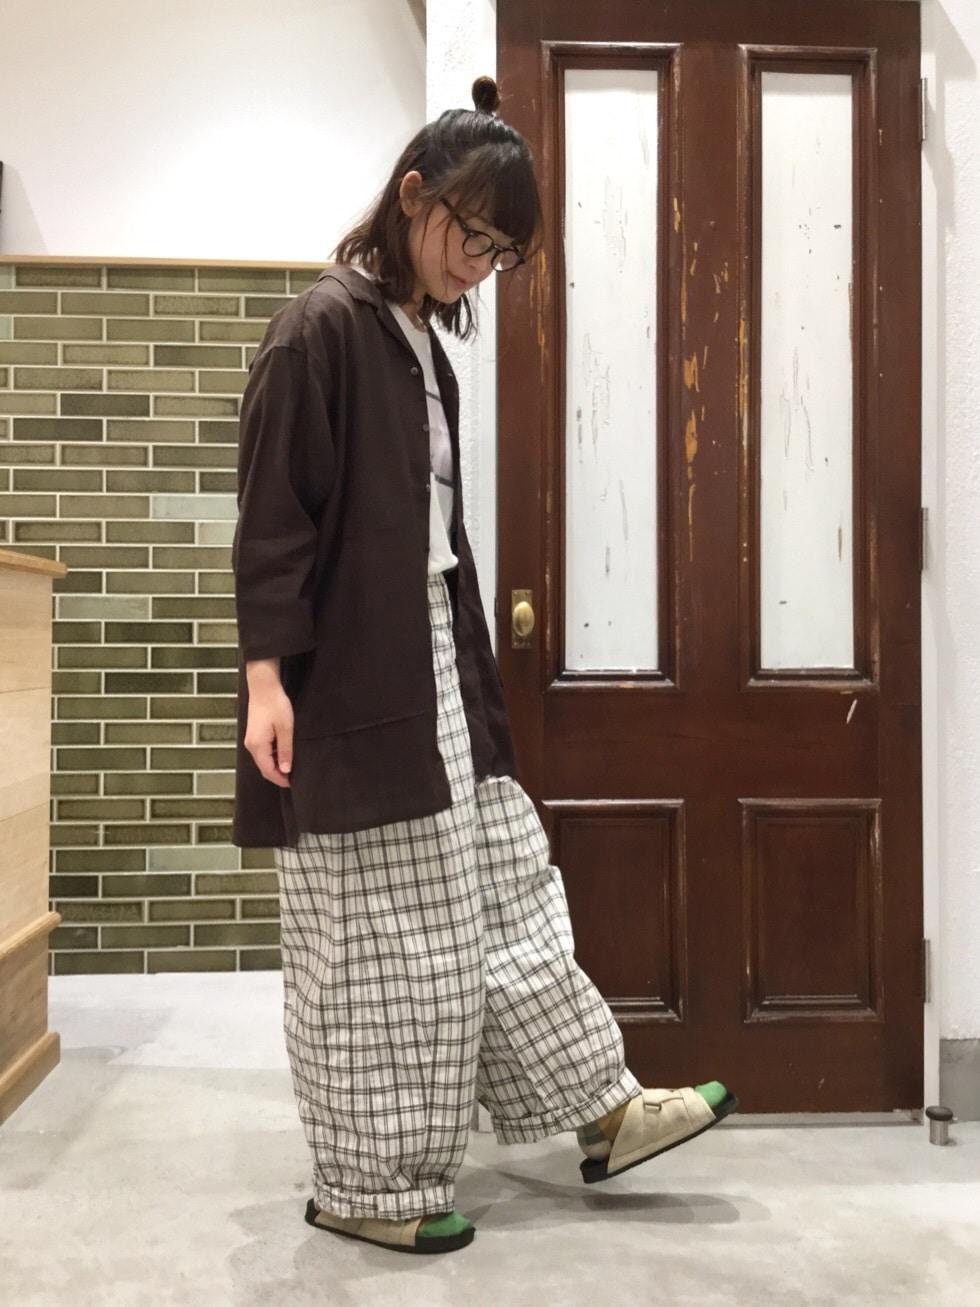 chambre de charme 横浜ジョイナス 身長:162cm 2020.07.07